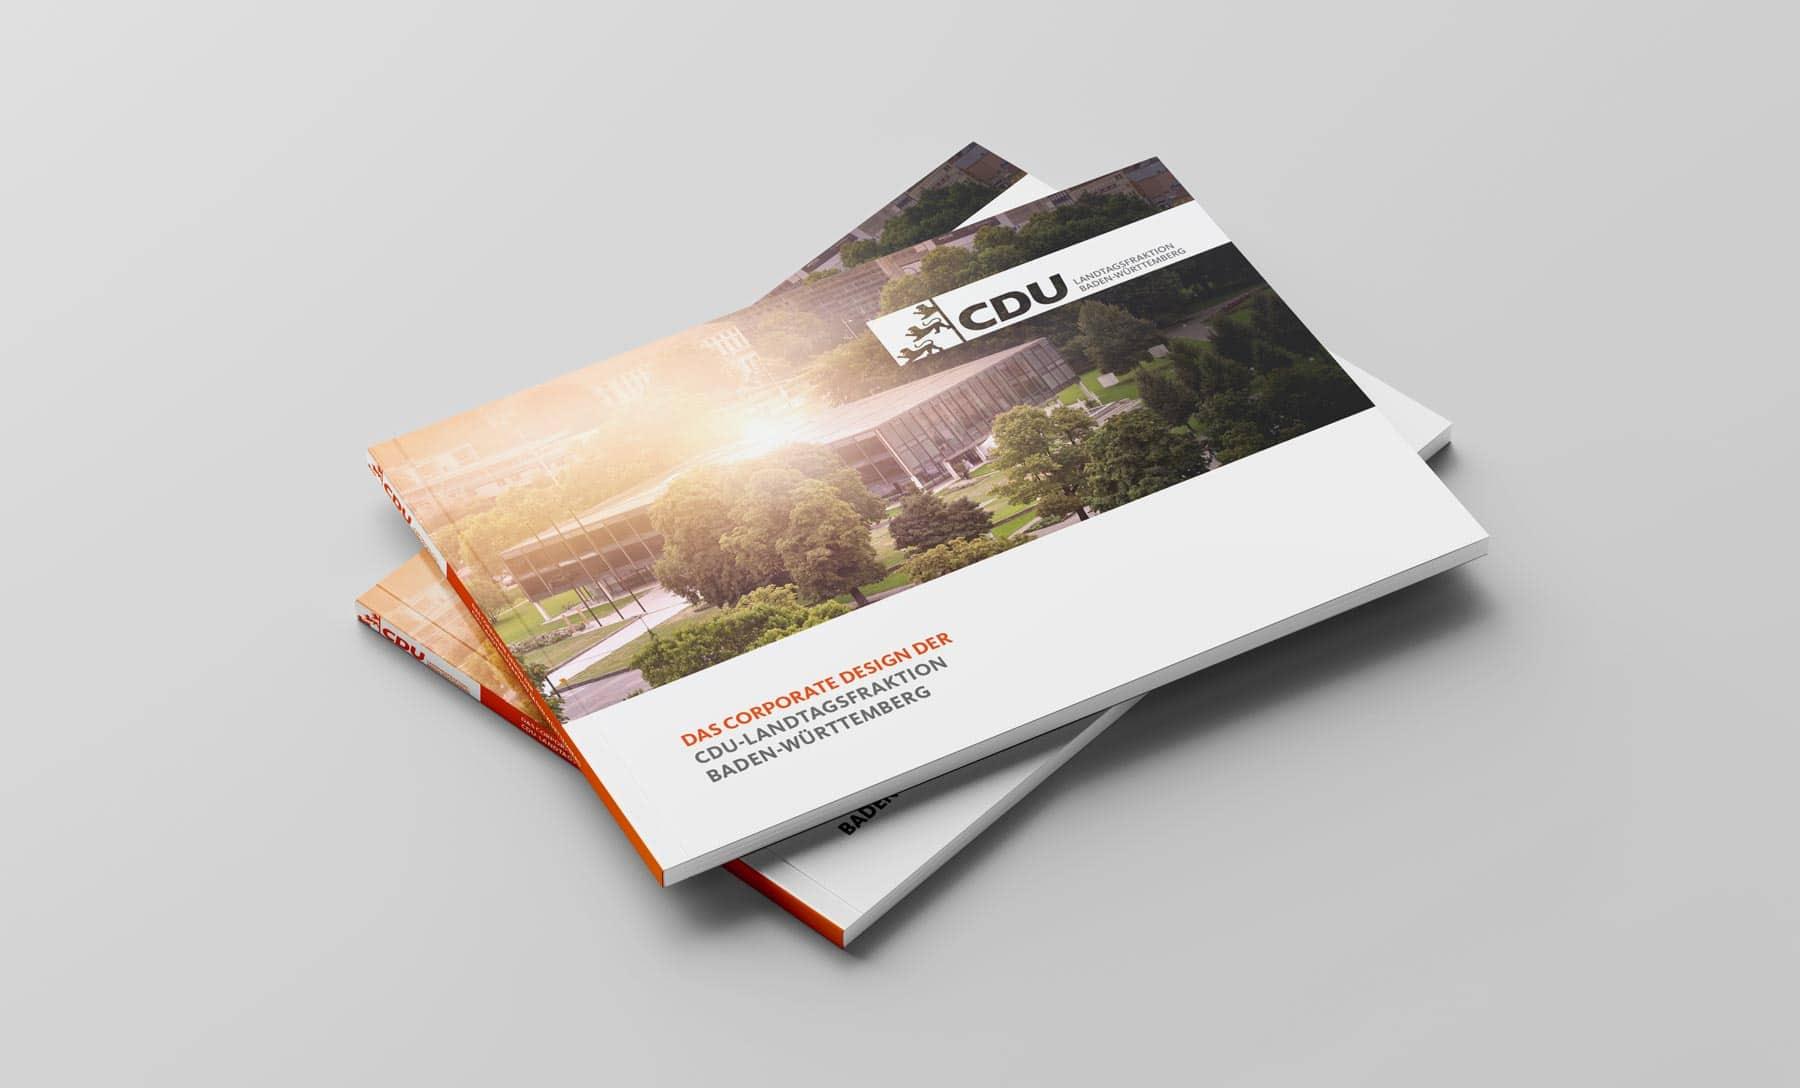 CDU_LF_BW, Styleguide, Corporate Design Relaunch, Redesign, Titel